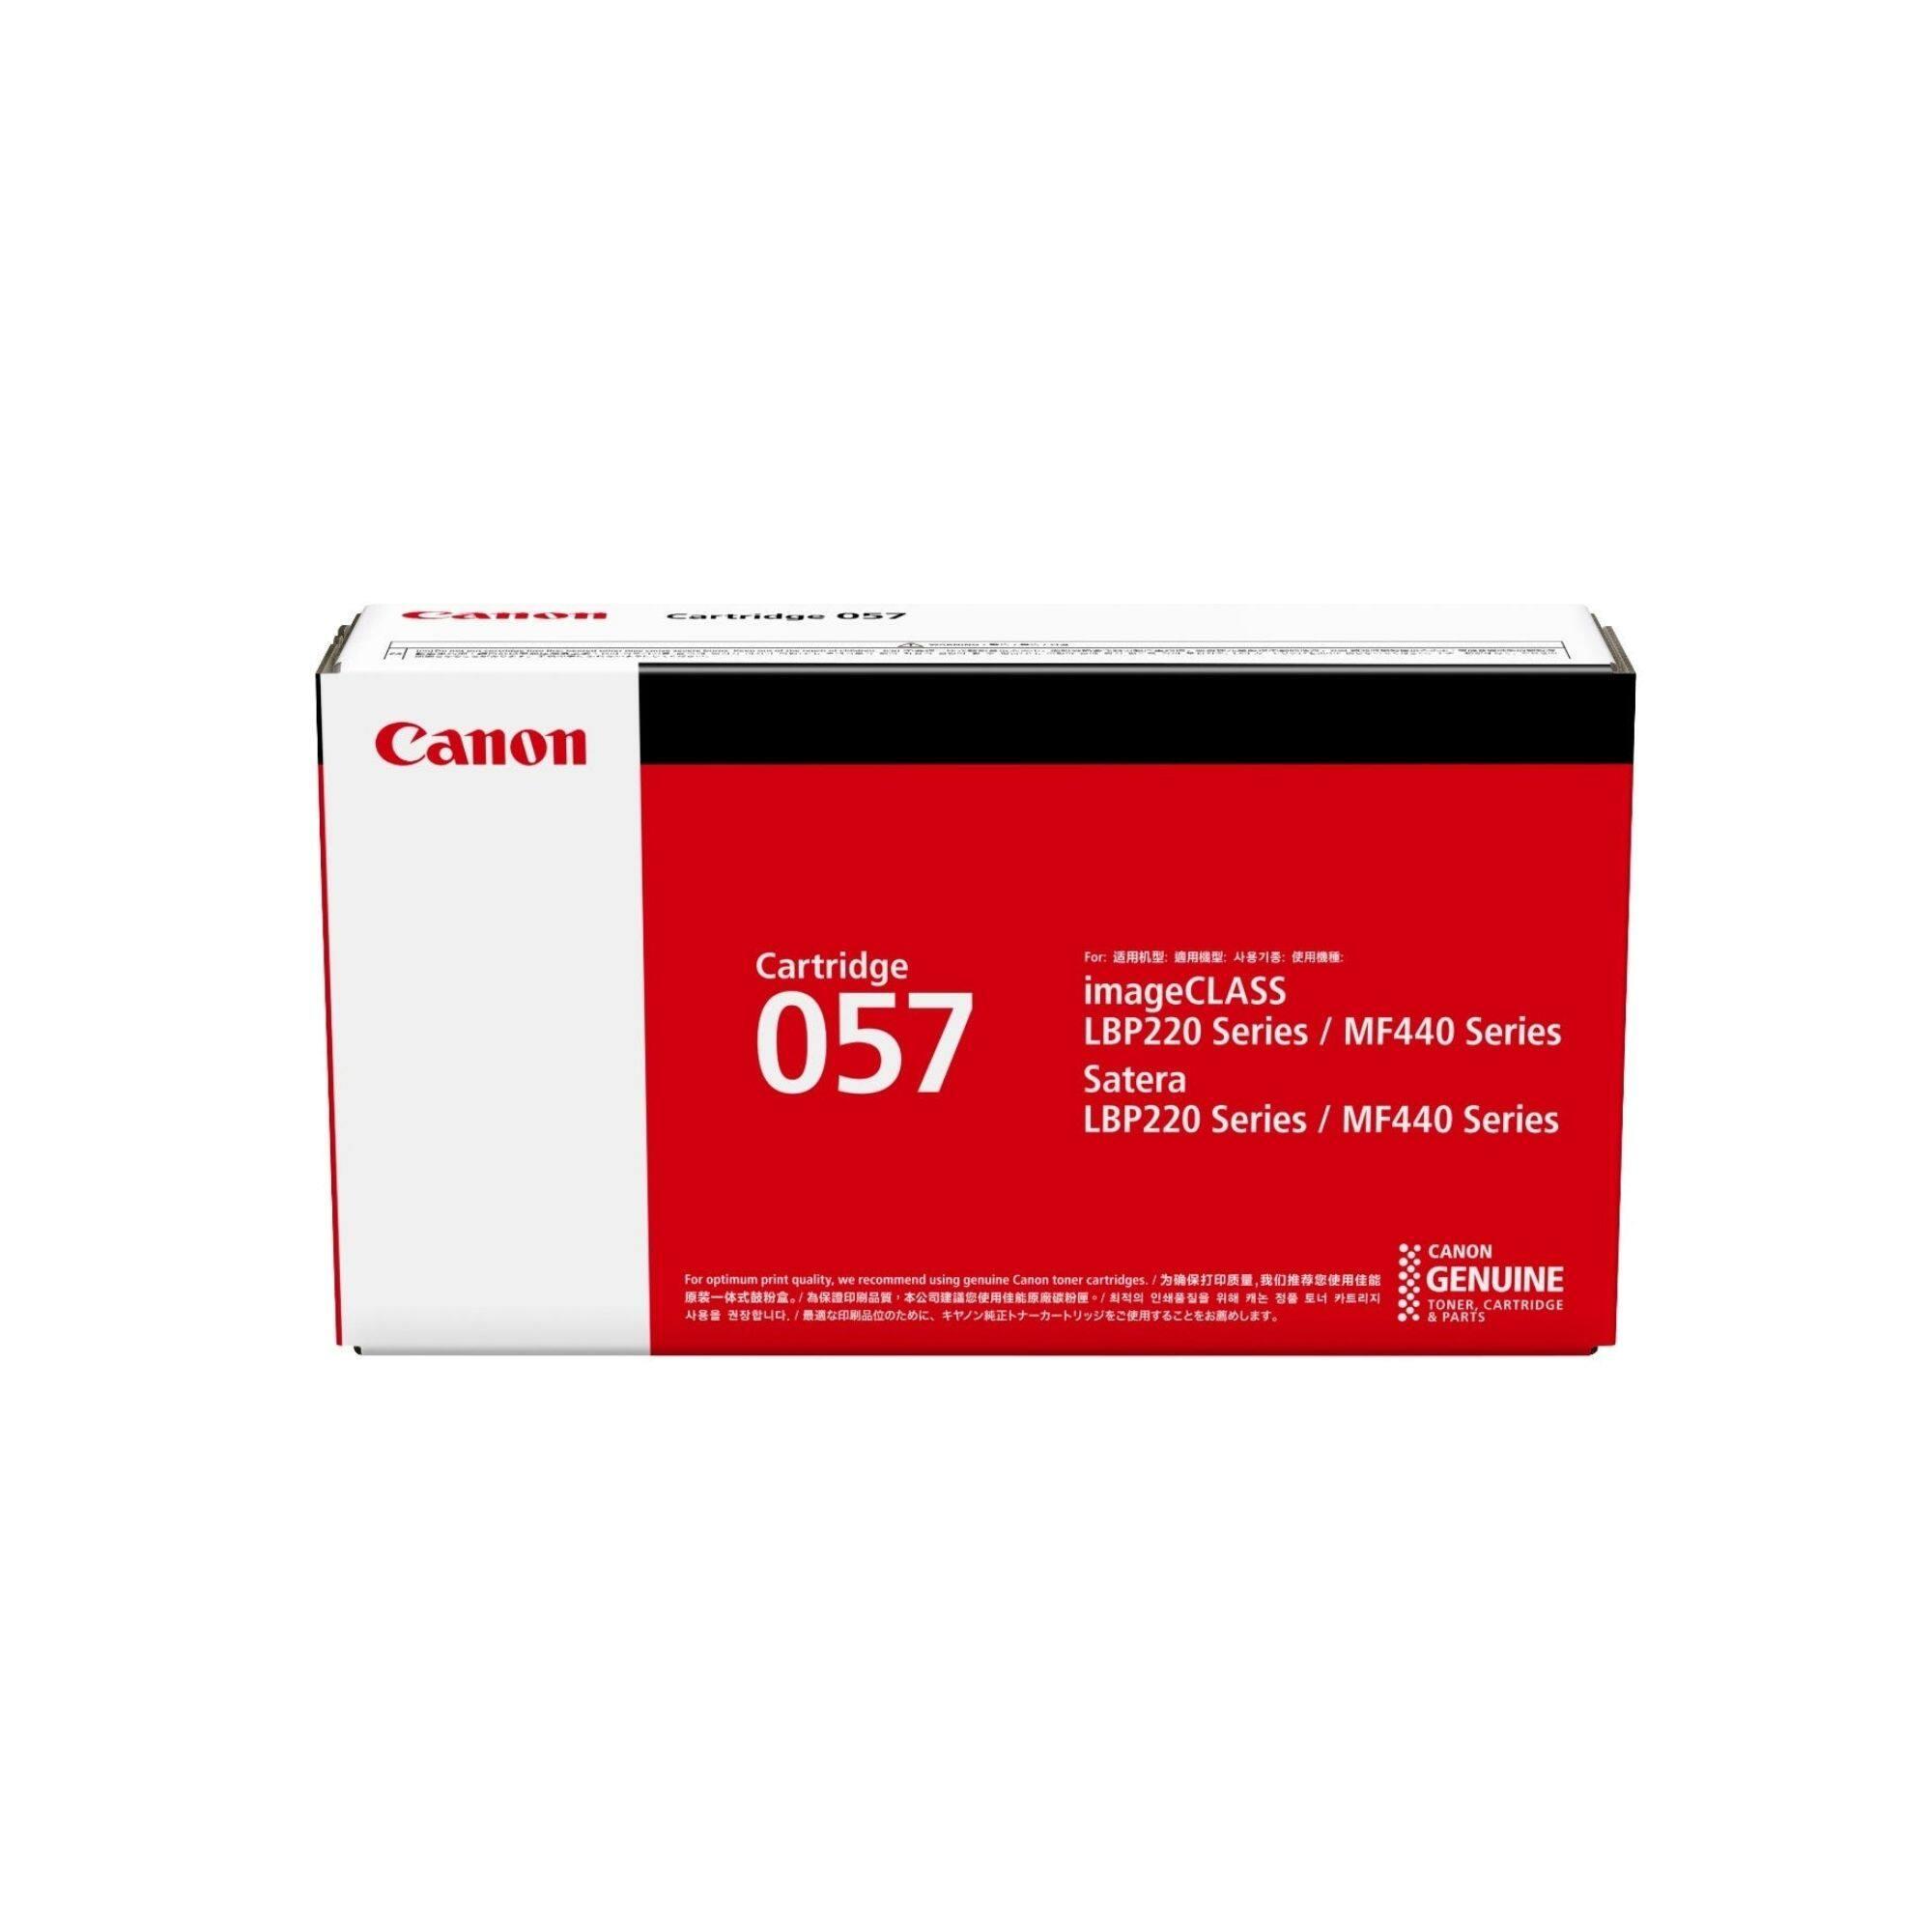 Canon 057 Toner Cartridge 3.1K for LBP226dw/LBP228x/MF445dw/MF449x PRINTER